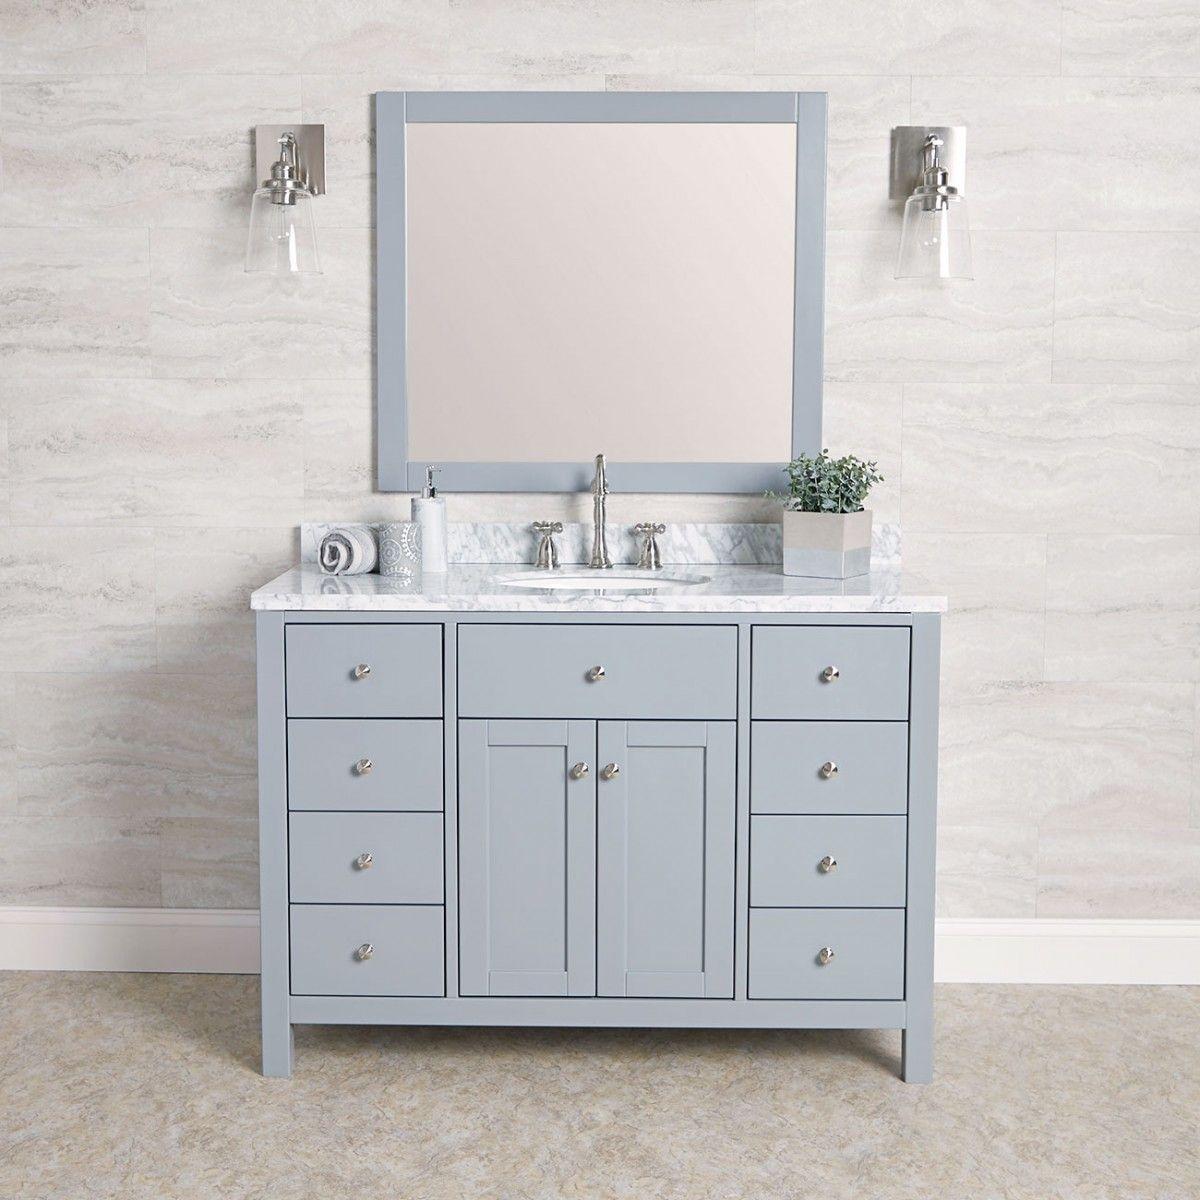 This Just In New Randolph Morris Bathroom Vanities The Hampton 48 Bathroom Vanities Are Expe Bathroom Vanity Single Bathroom Vanity 48 Inch Bathroom Vanity